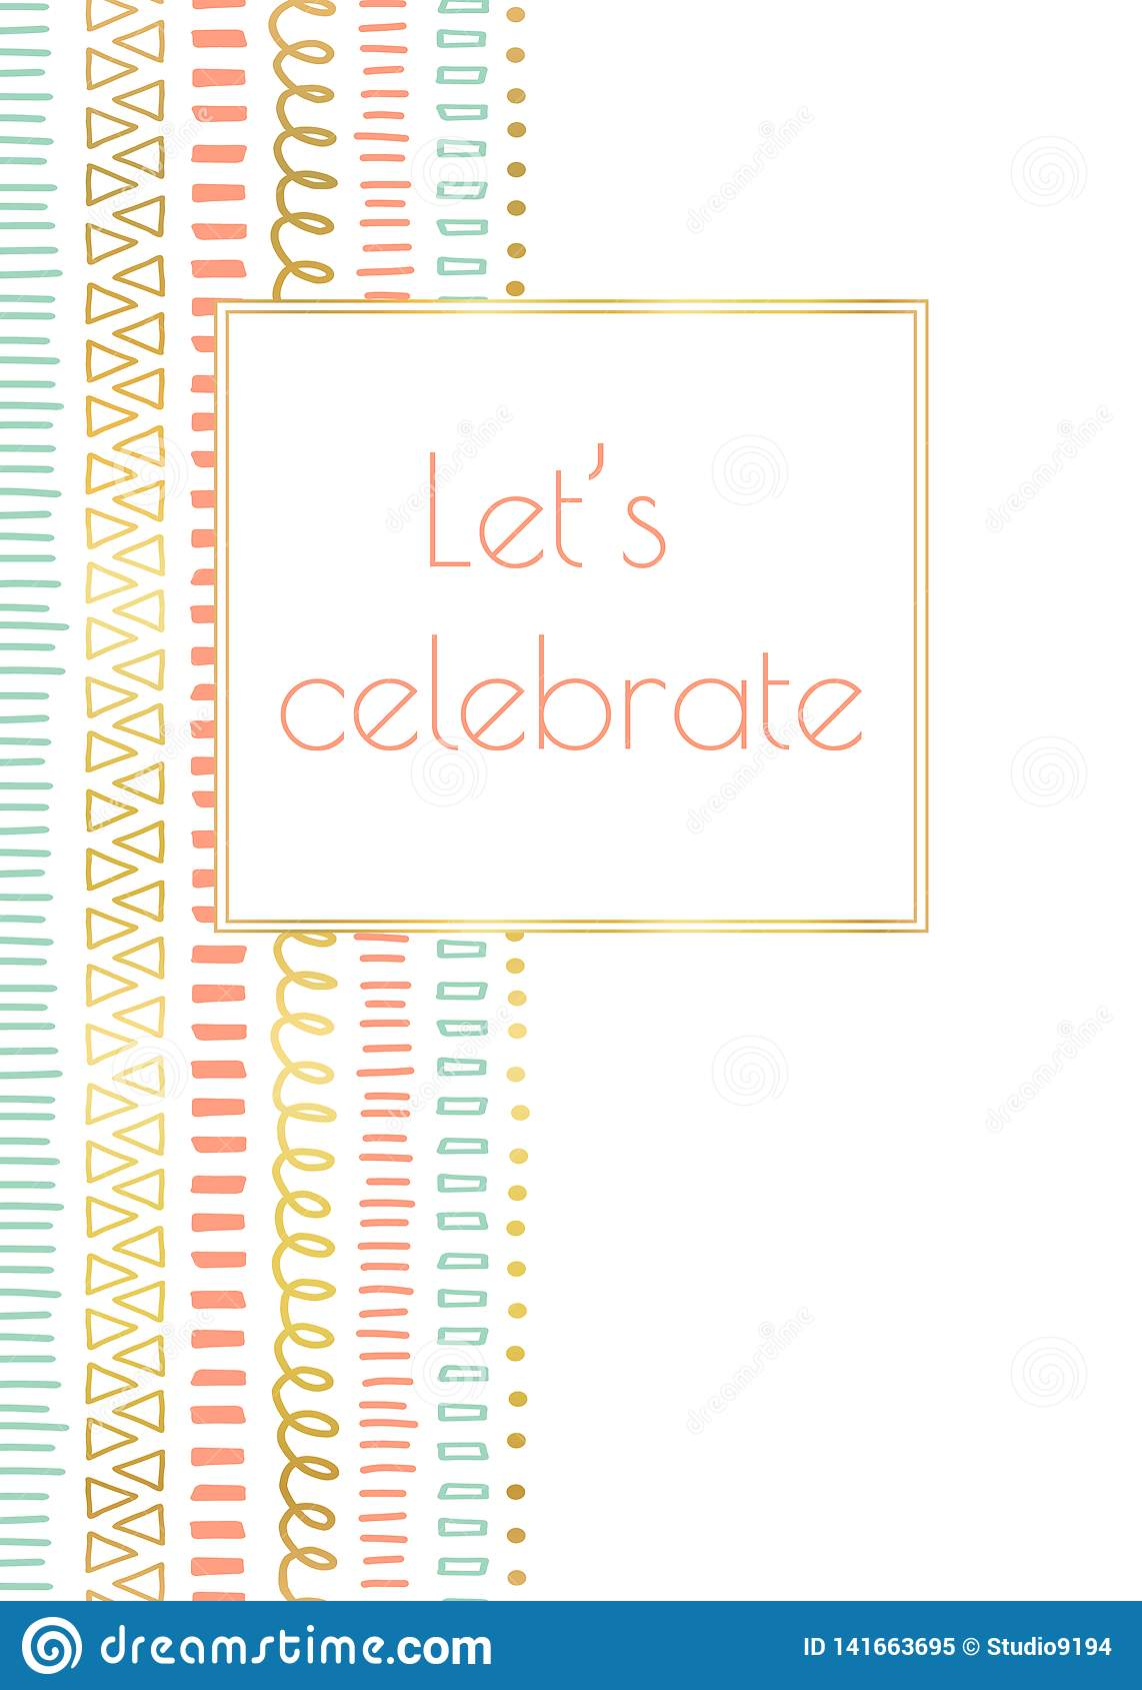 Let`s celebrate invitation doodle card vector